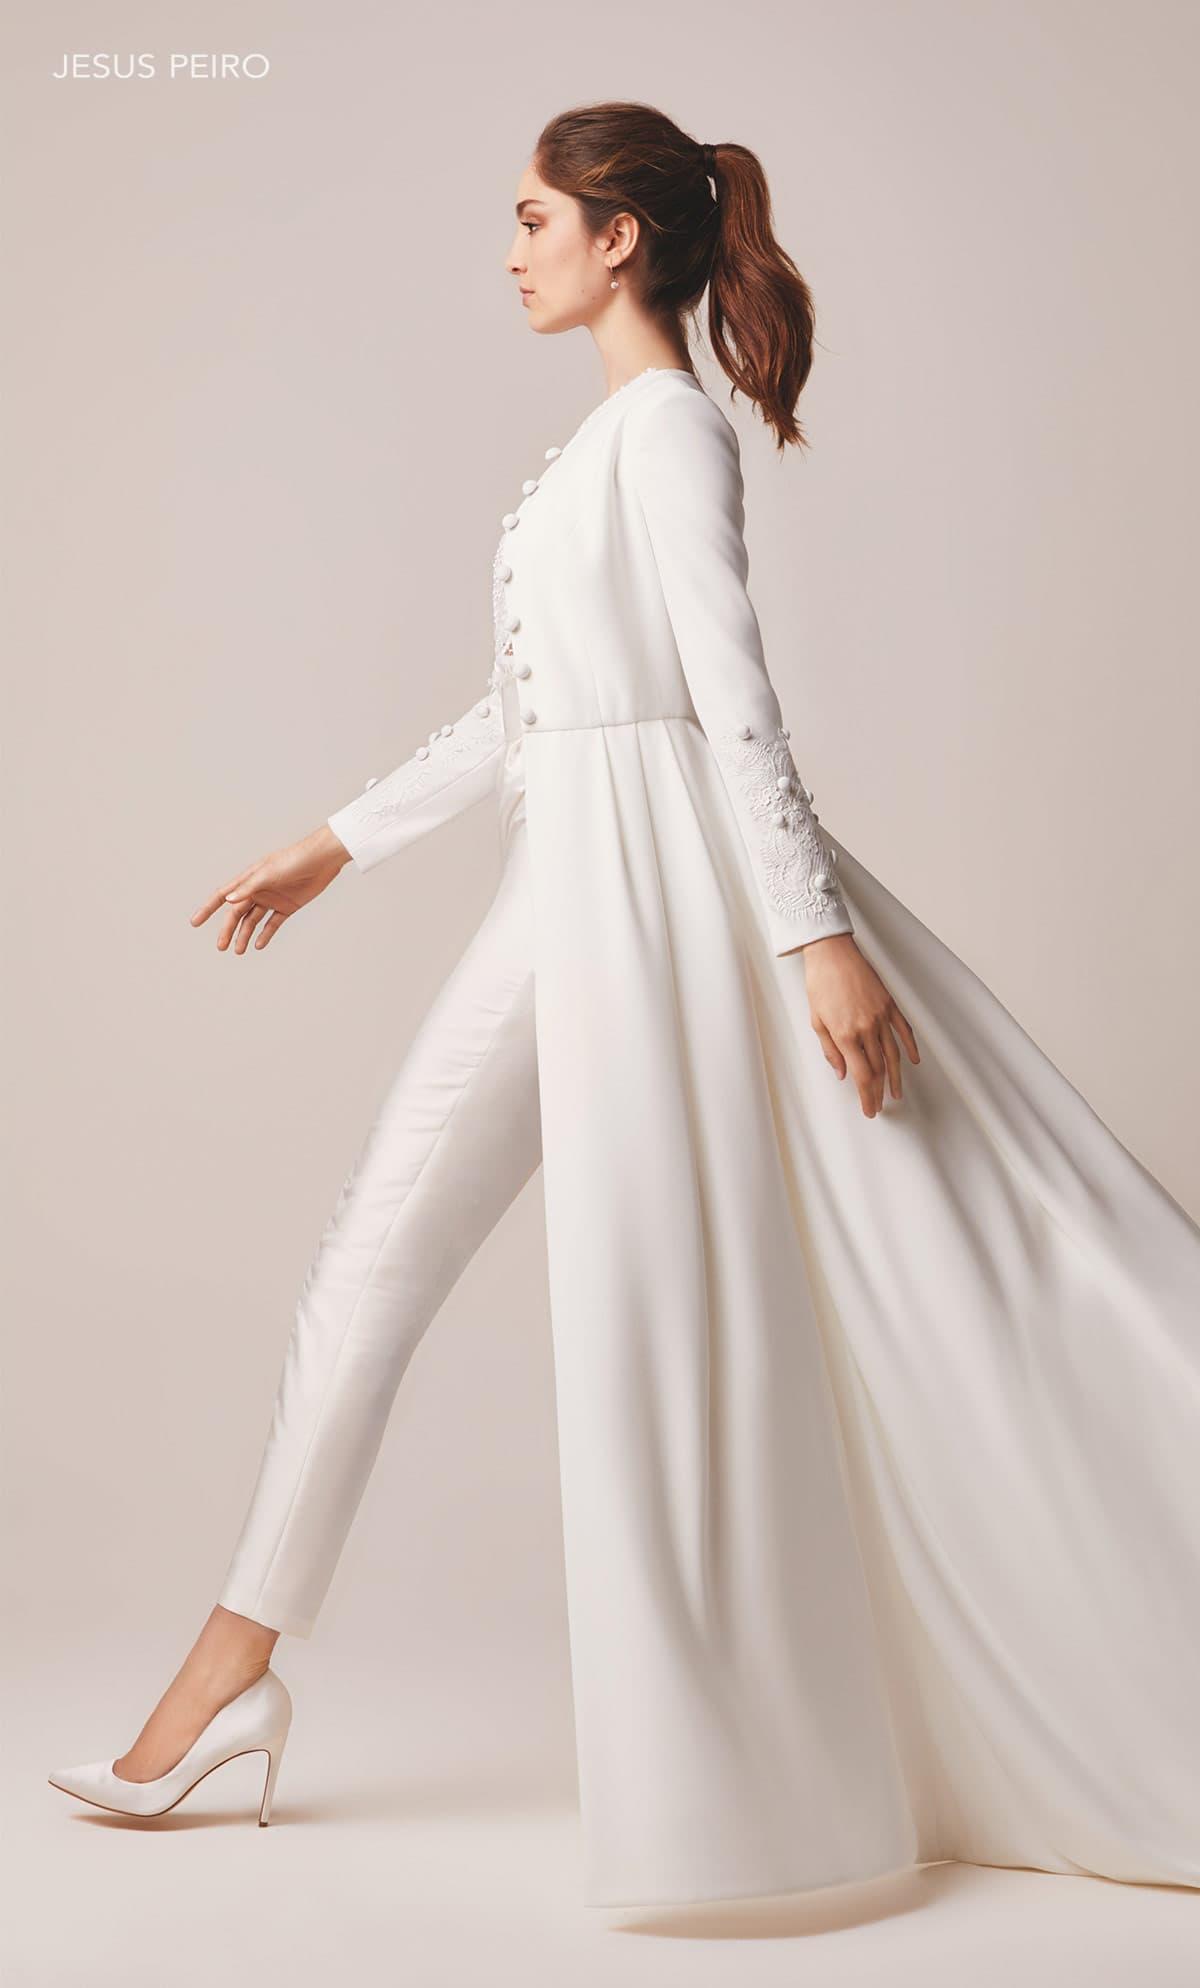 Novia con traje pantalón de Jesús Peiró